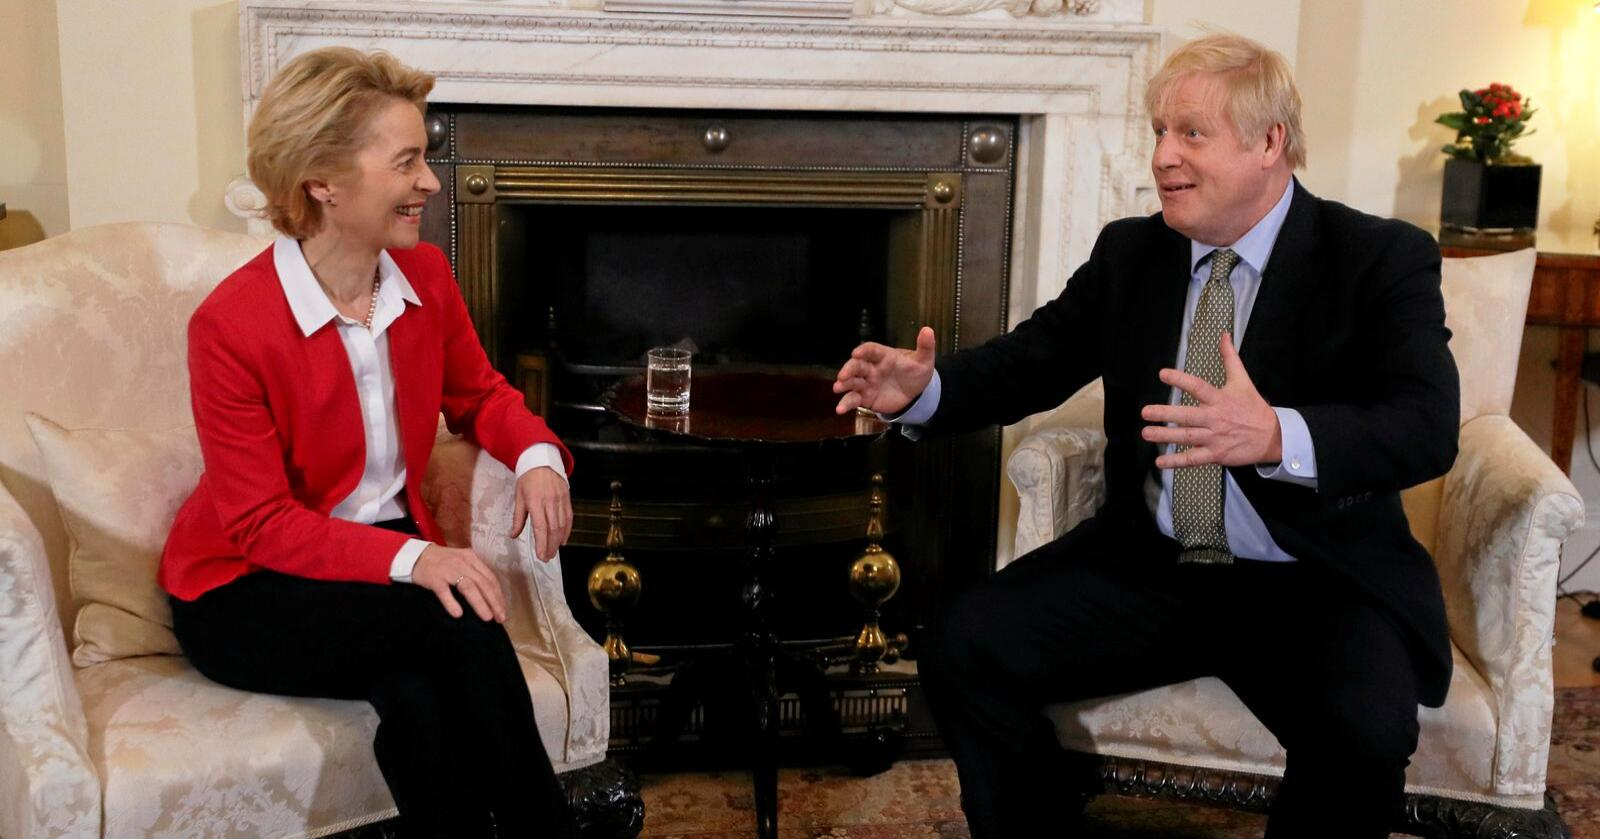 Storbritannias statsminister Boris Johnson tok imot EU-kommisjonens president Ursula von der Leyen i Downing Street i London onsdag. Foto: Kirsty Wigglesworth / AP / NTB scanpix